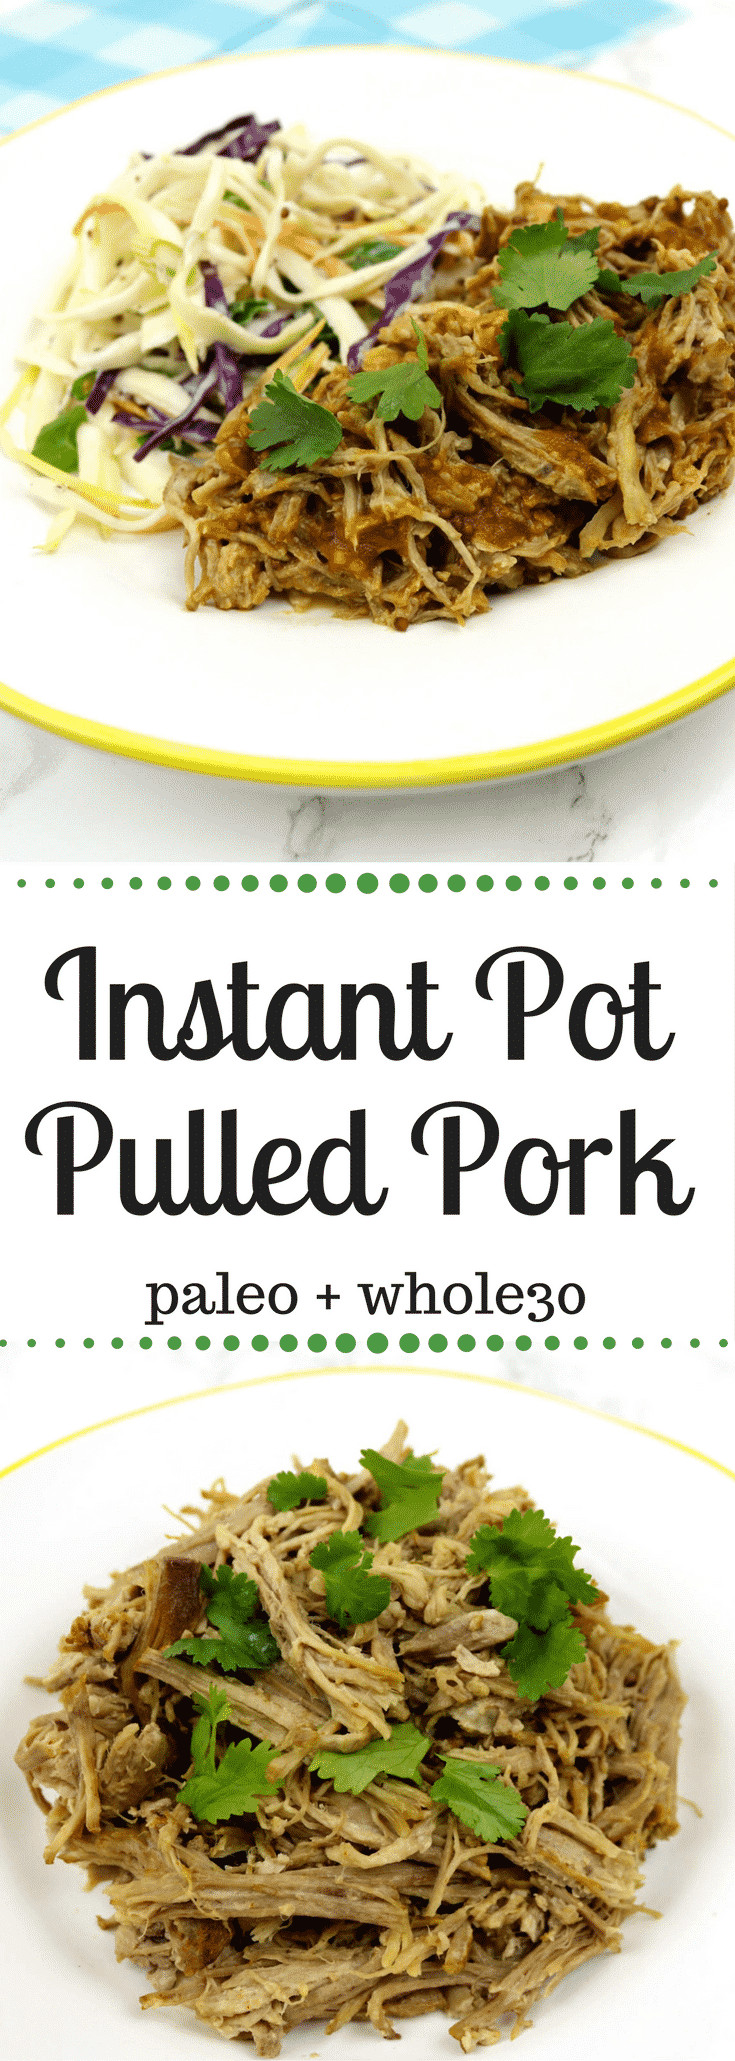 Instant Pot Recipes Paleo  Instant Pot Pulled Pork Paleo Whole30 Recipe